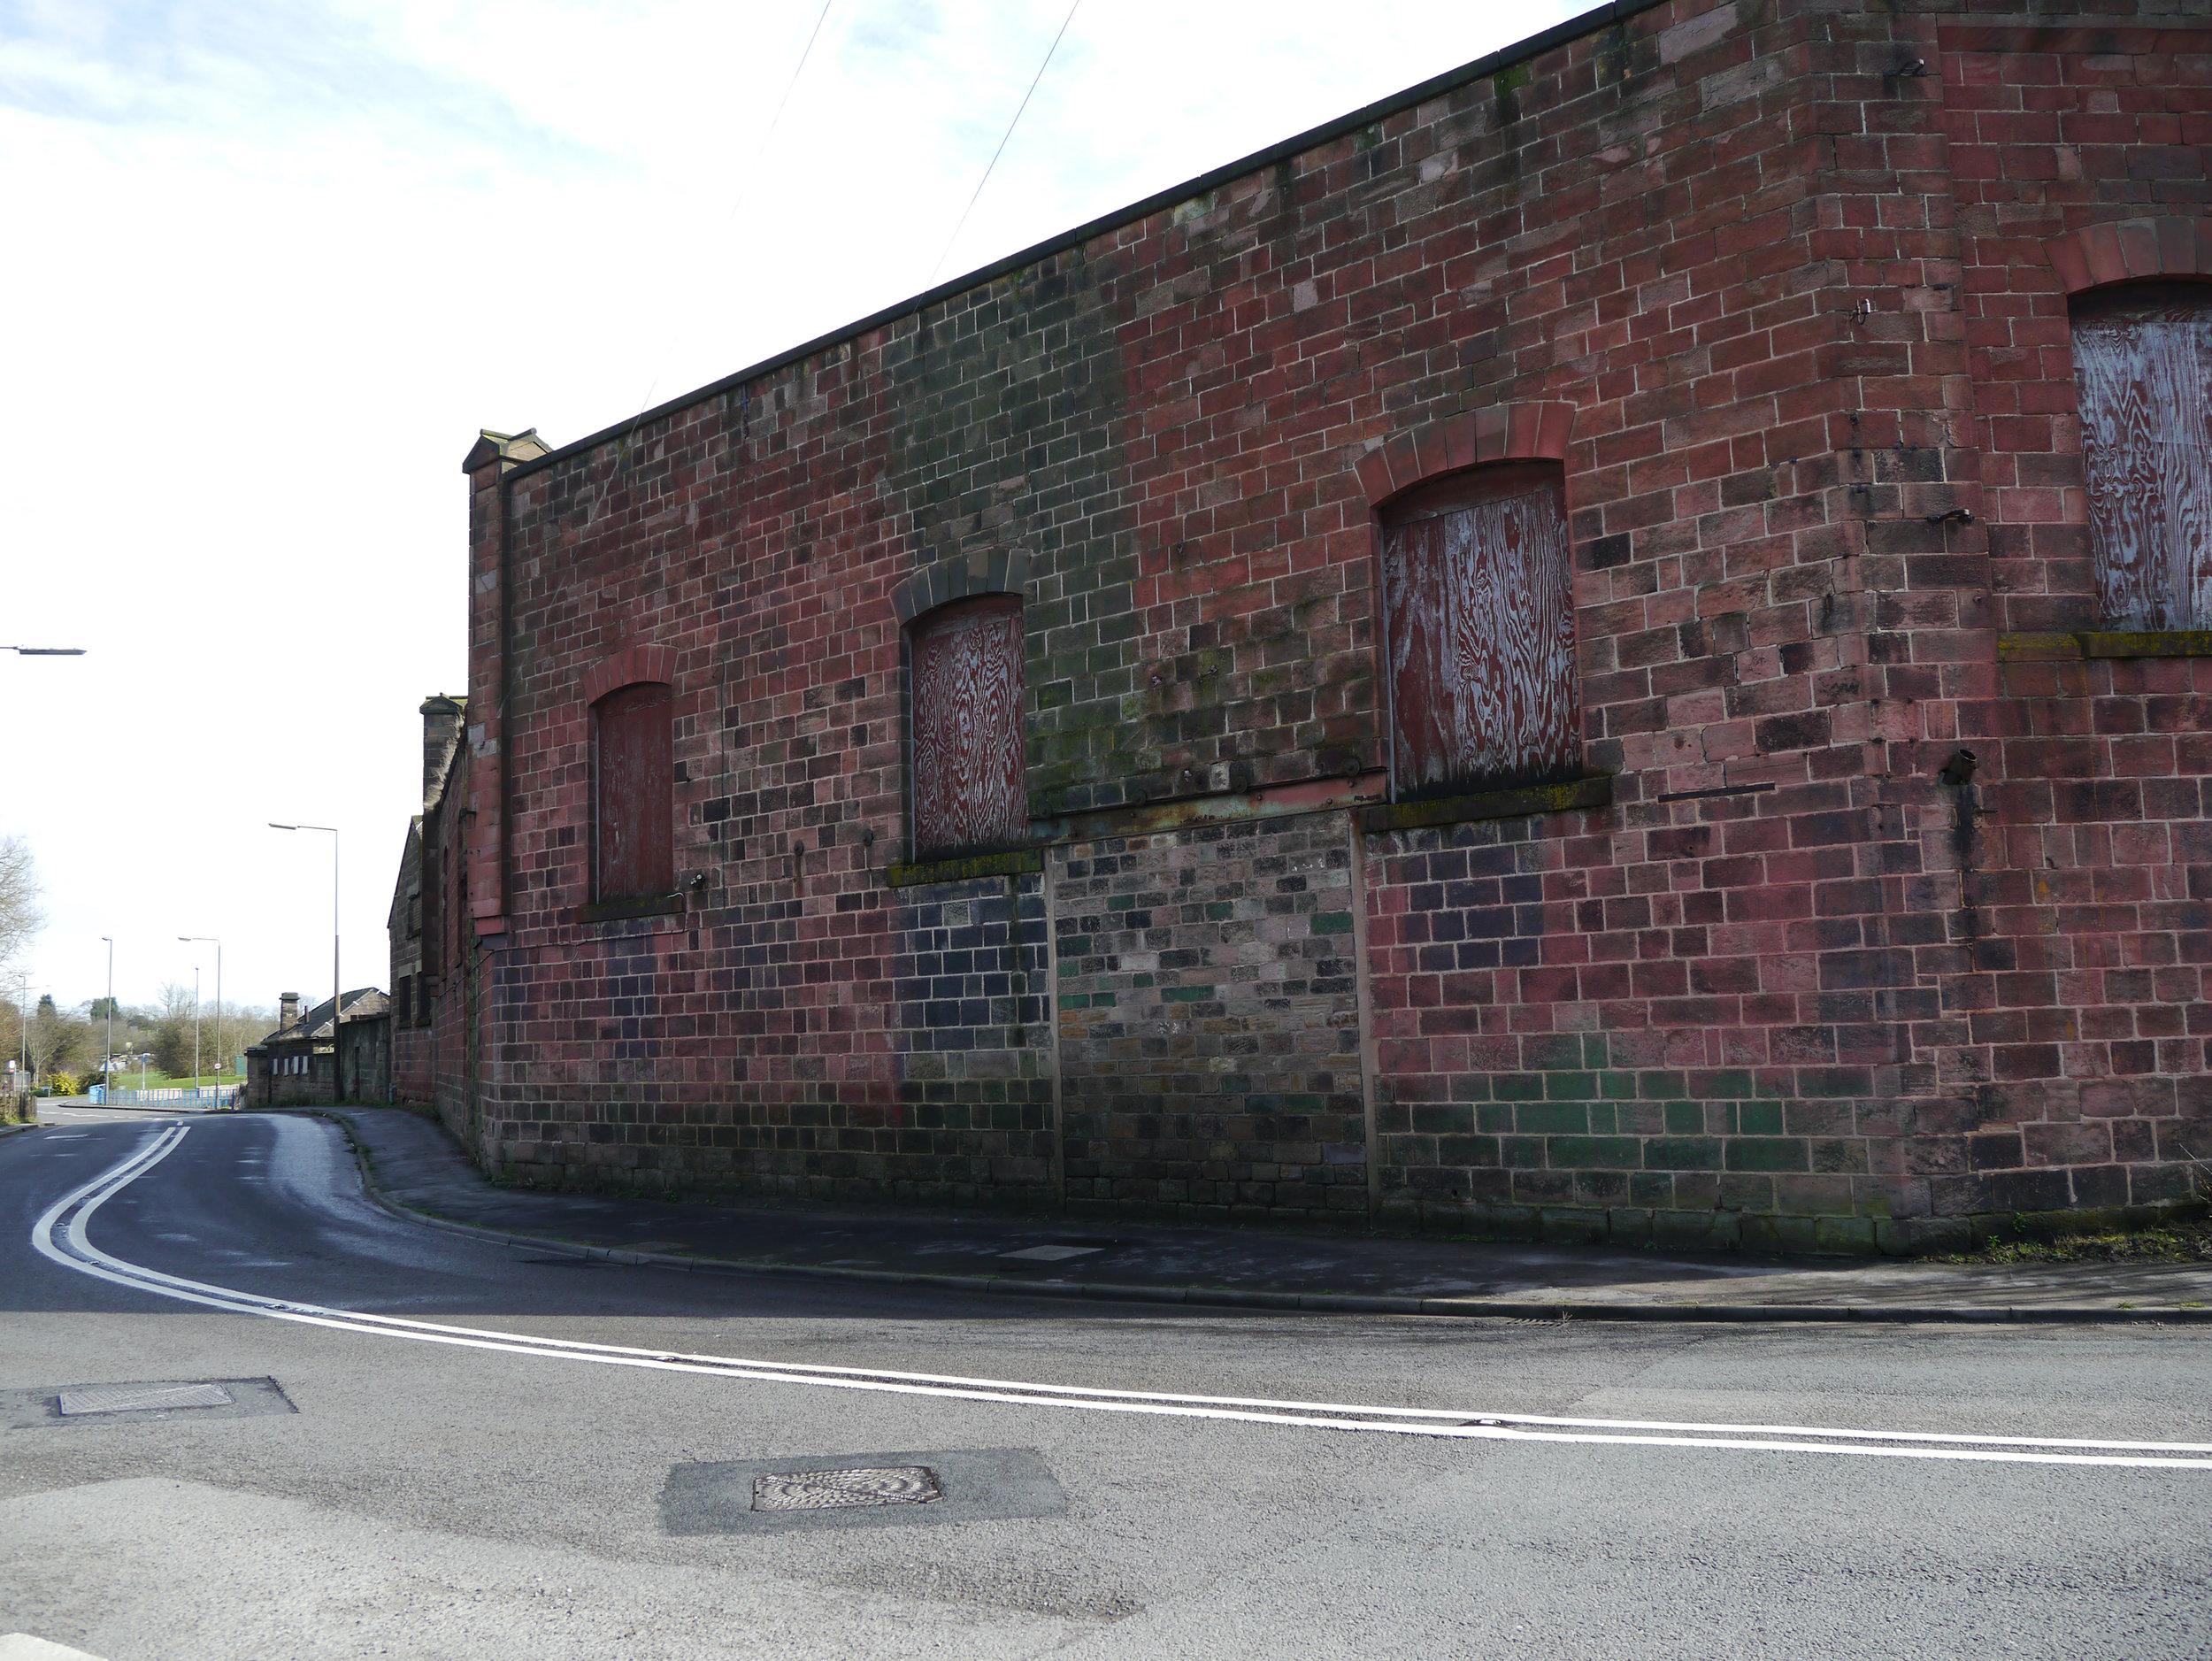 Butterley Works